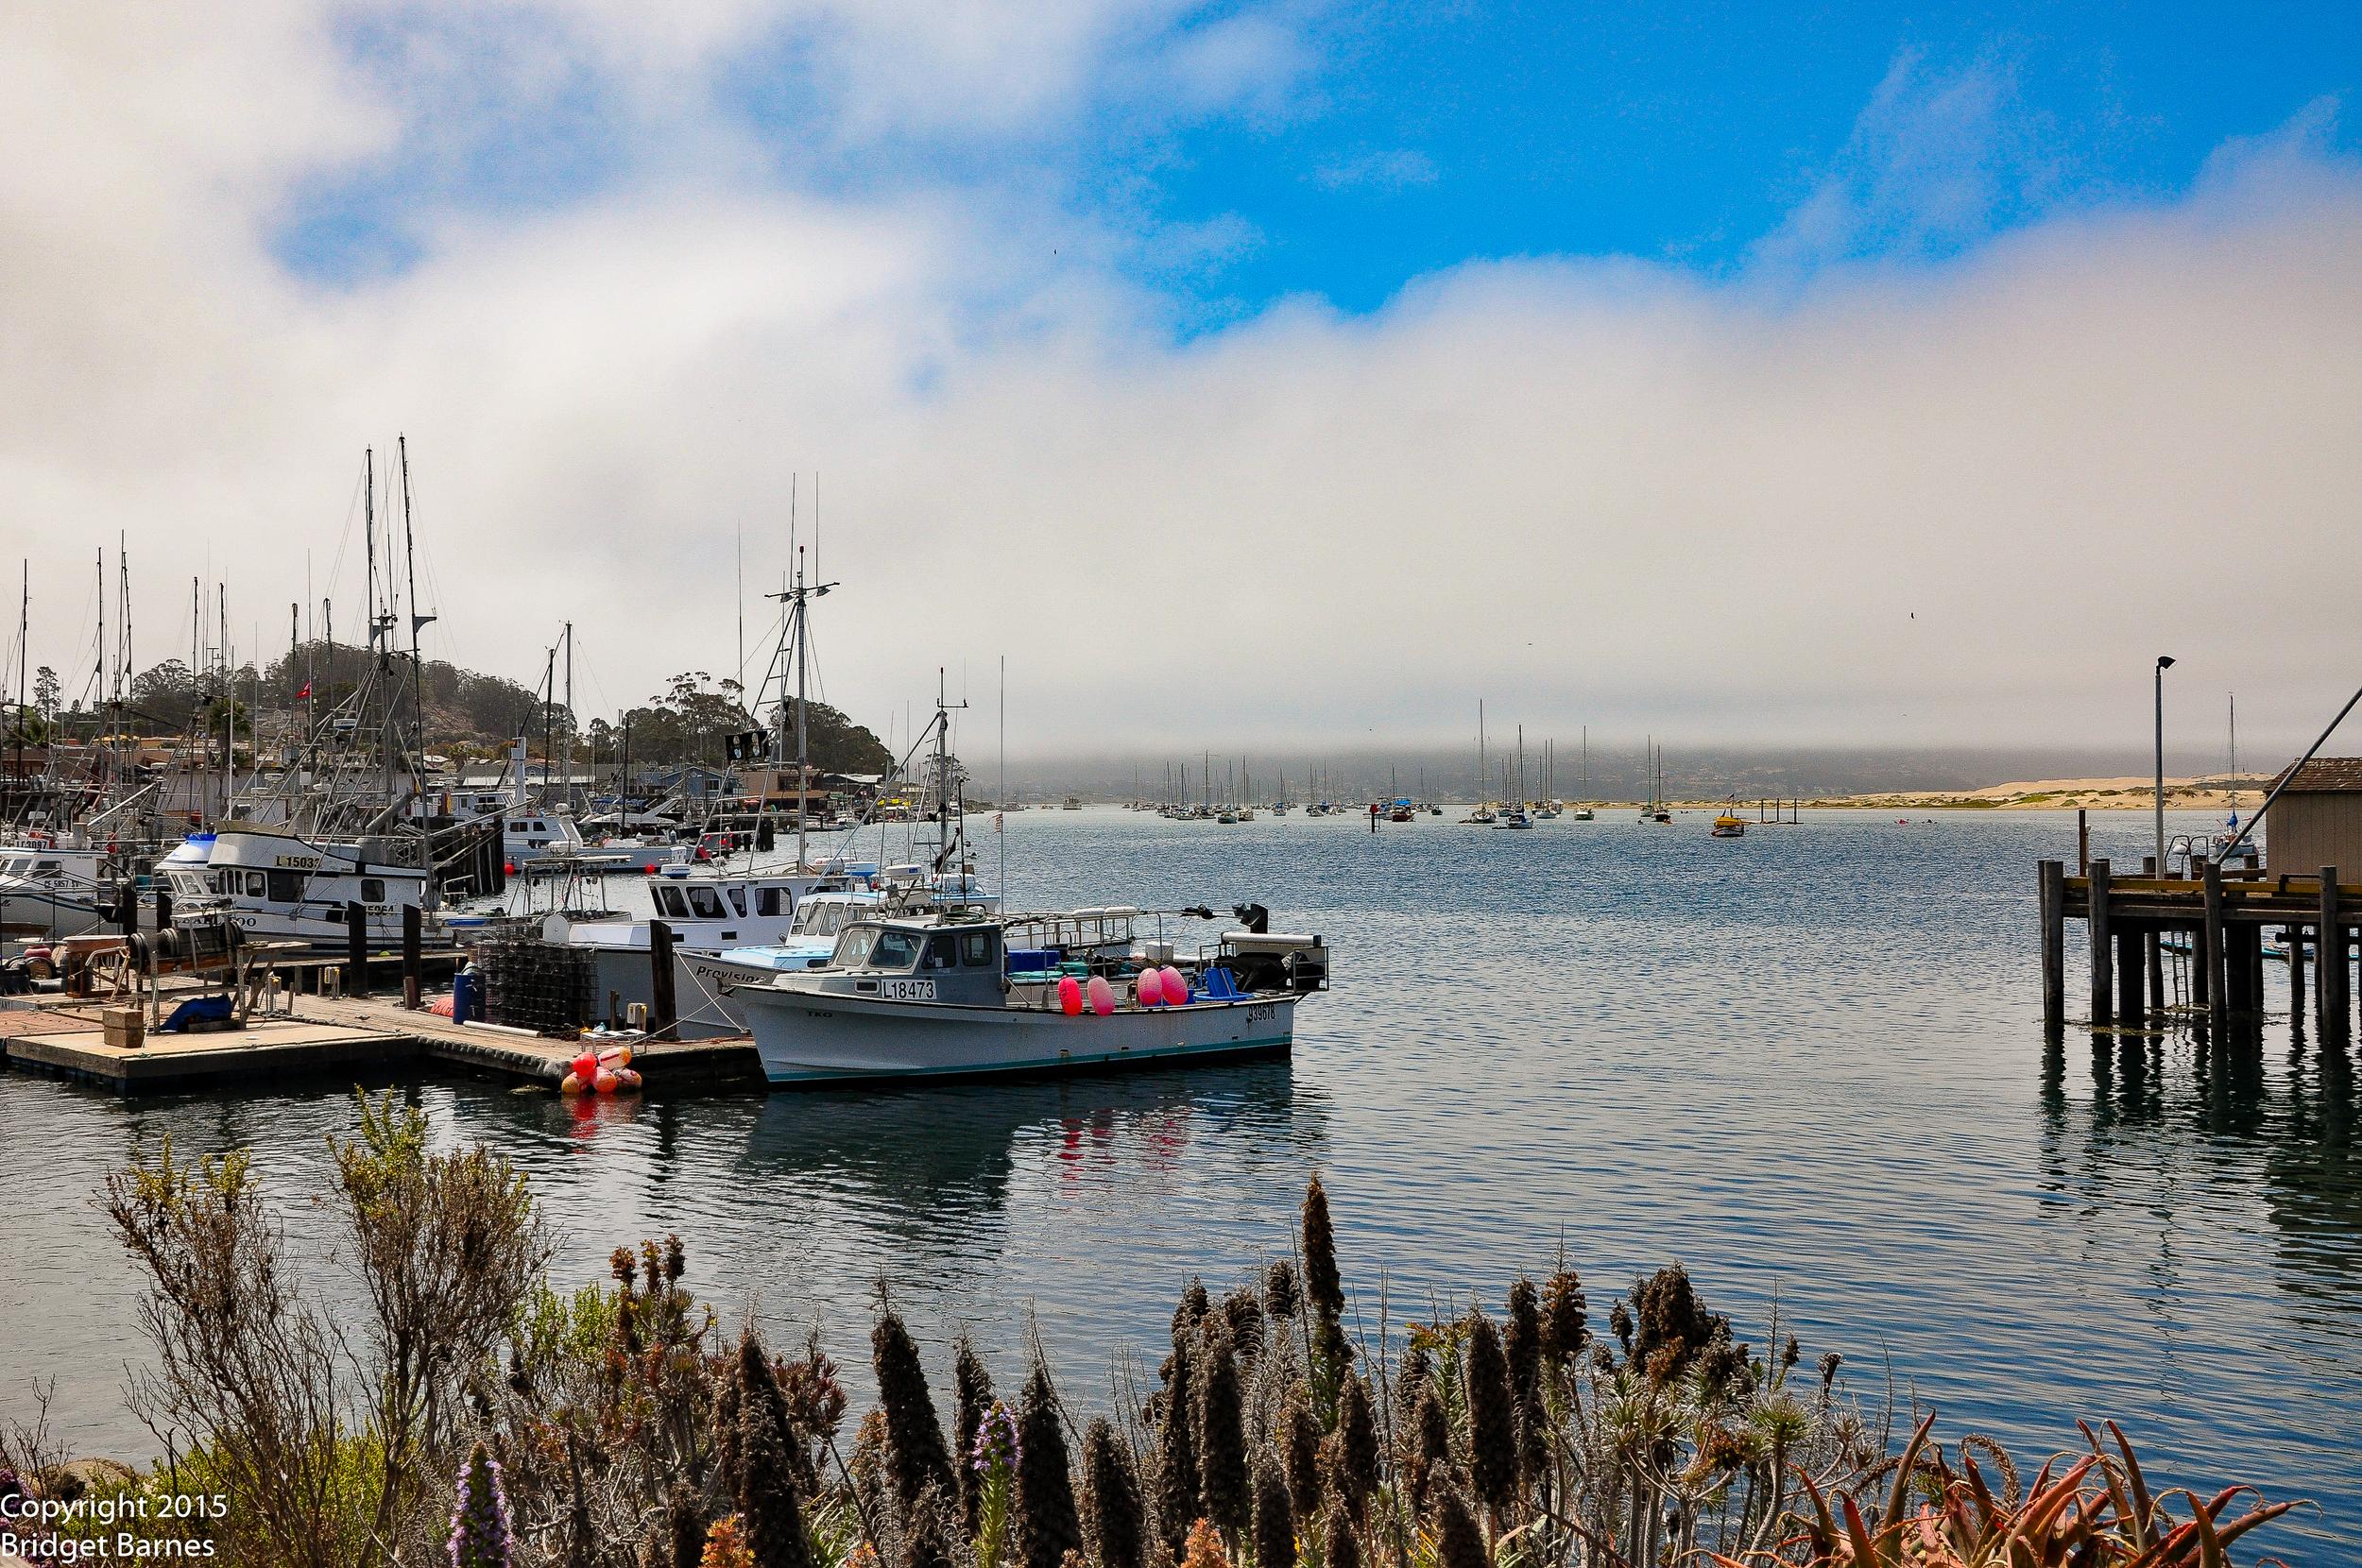 Boats in Morro Bay, California